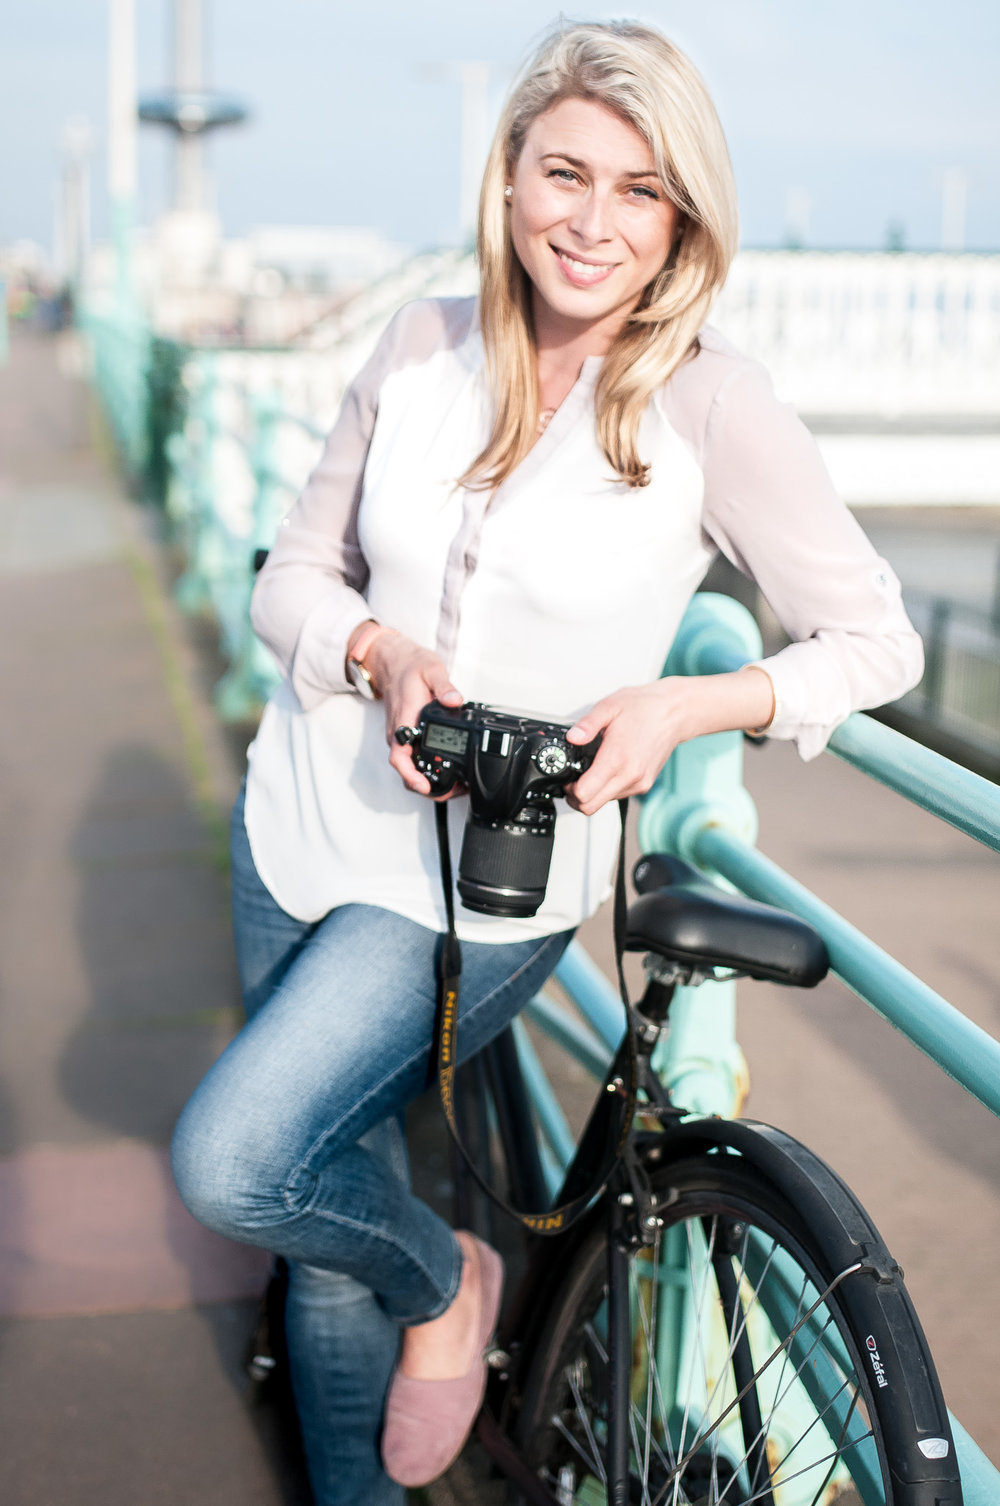 London & Brighton Personal Brand Portrait Photographer - Portrait Photography